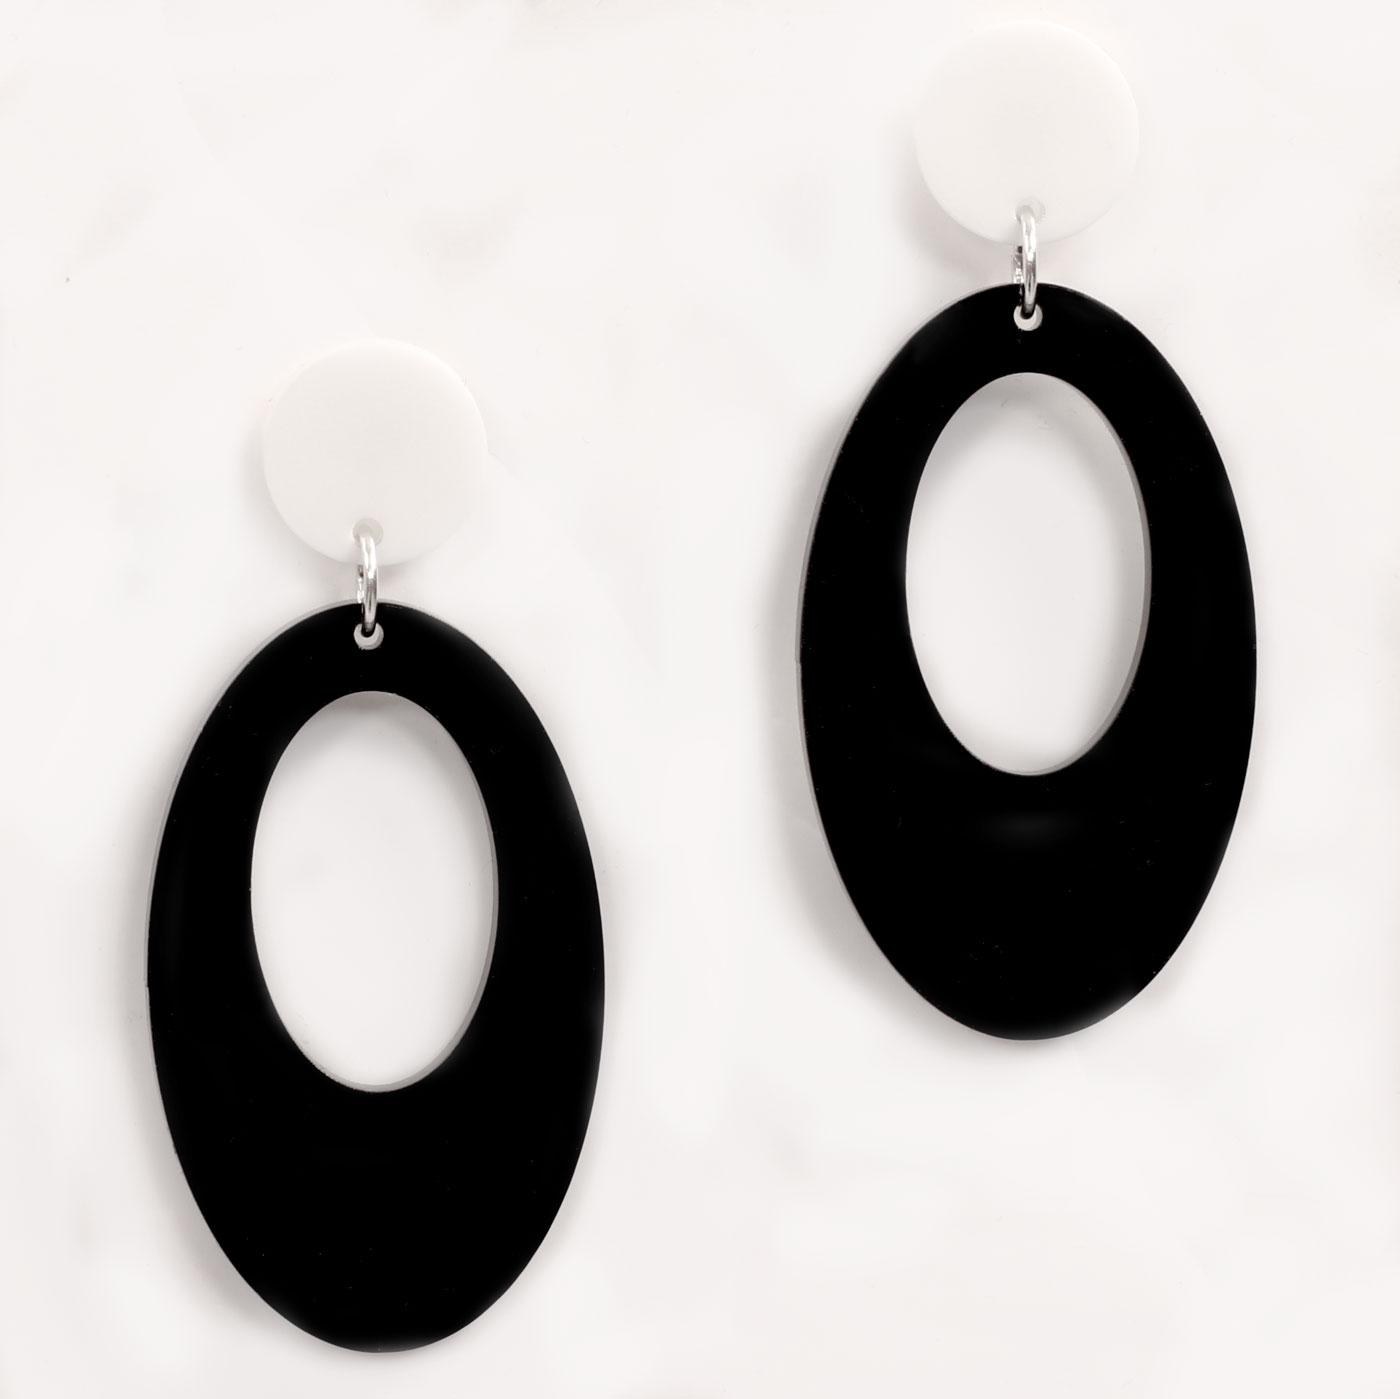 +ADA BINKS for MADCAP ENGLAND Mod Oval Earrings B